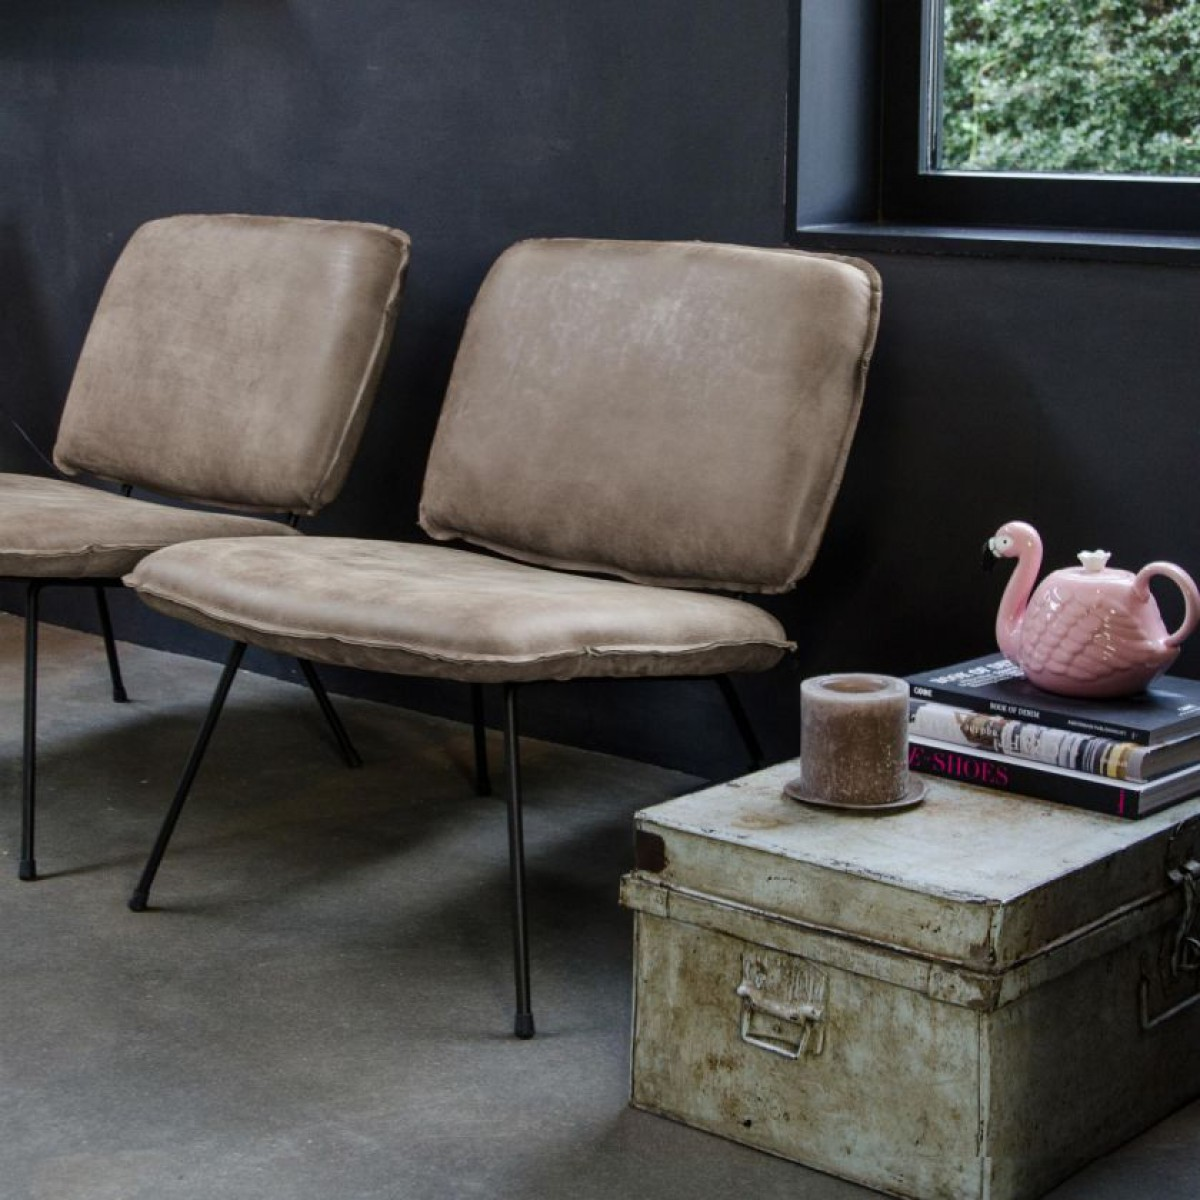 fauteuil_caramba_shabbies_fred_de_la_bretoniere_africa_leer_walnut_miltonhouse-tin